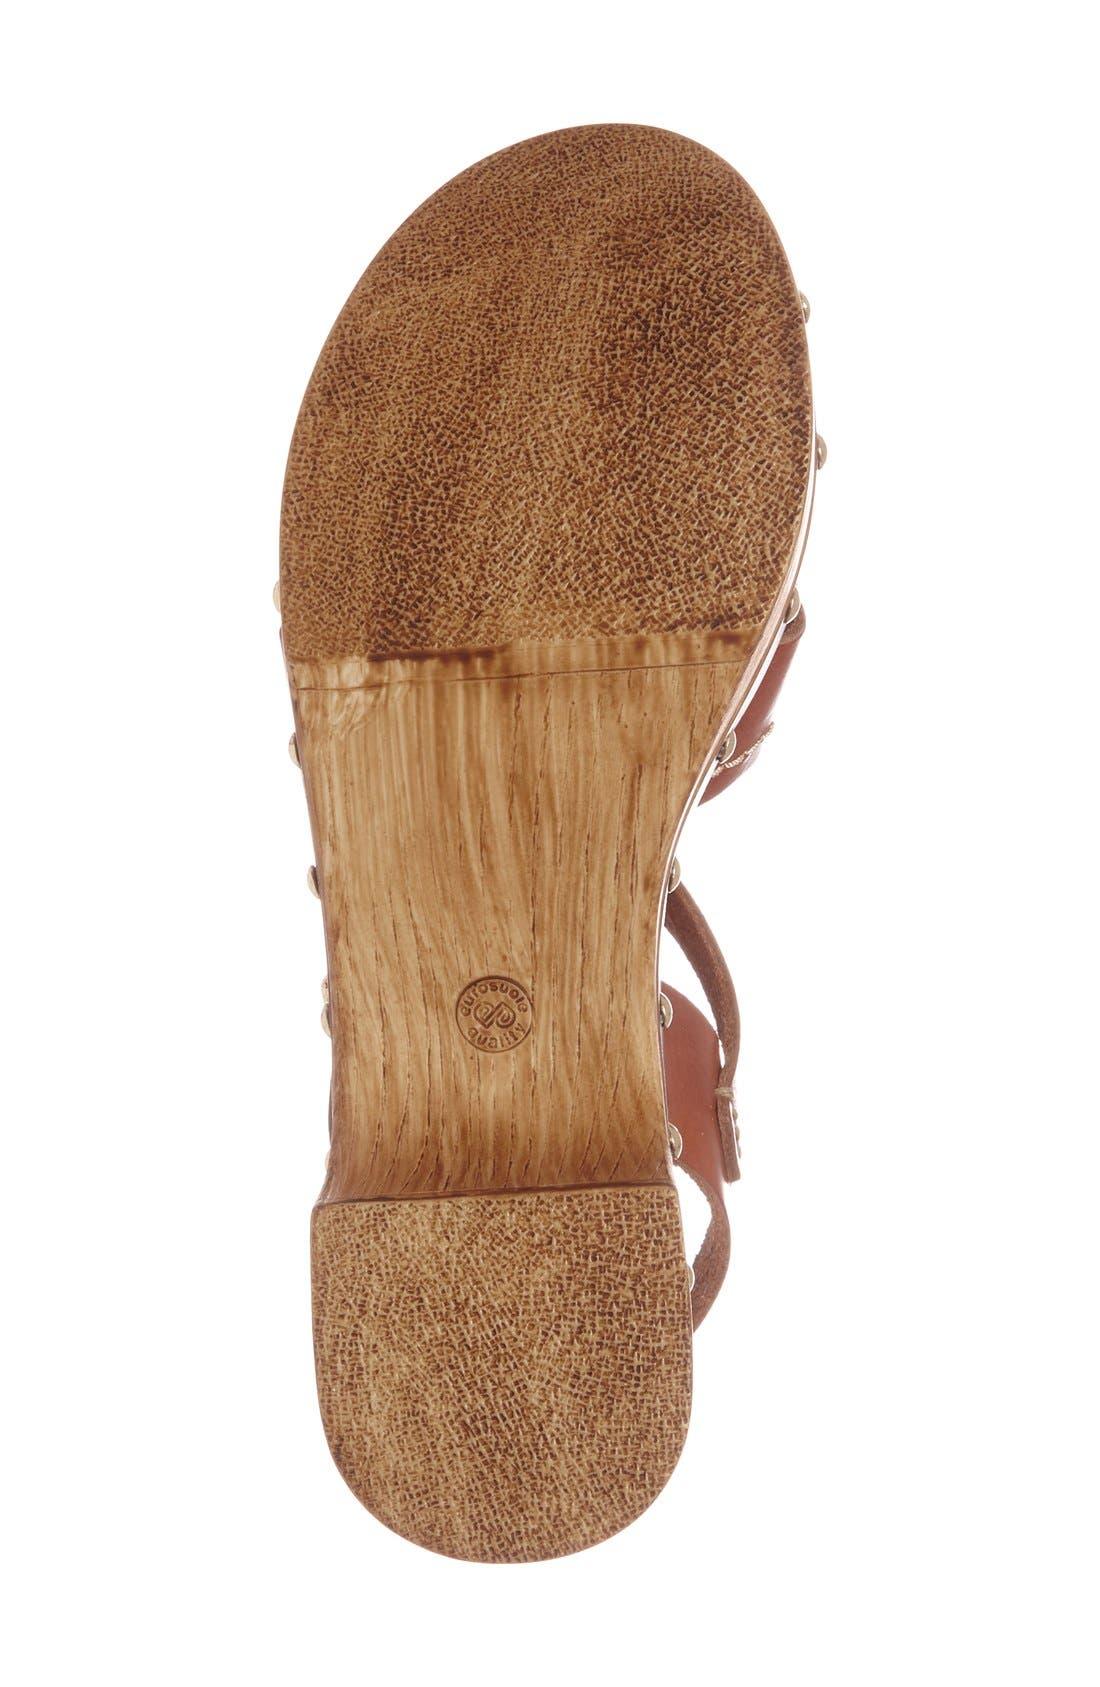 'VIV' Clog Sandals,                             Alternate thumbnail 4, color,                             Tan